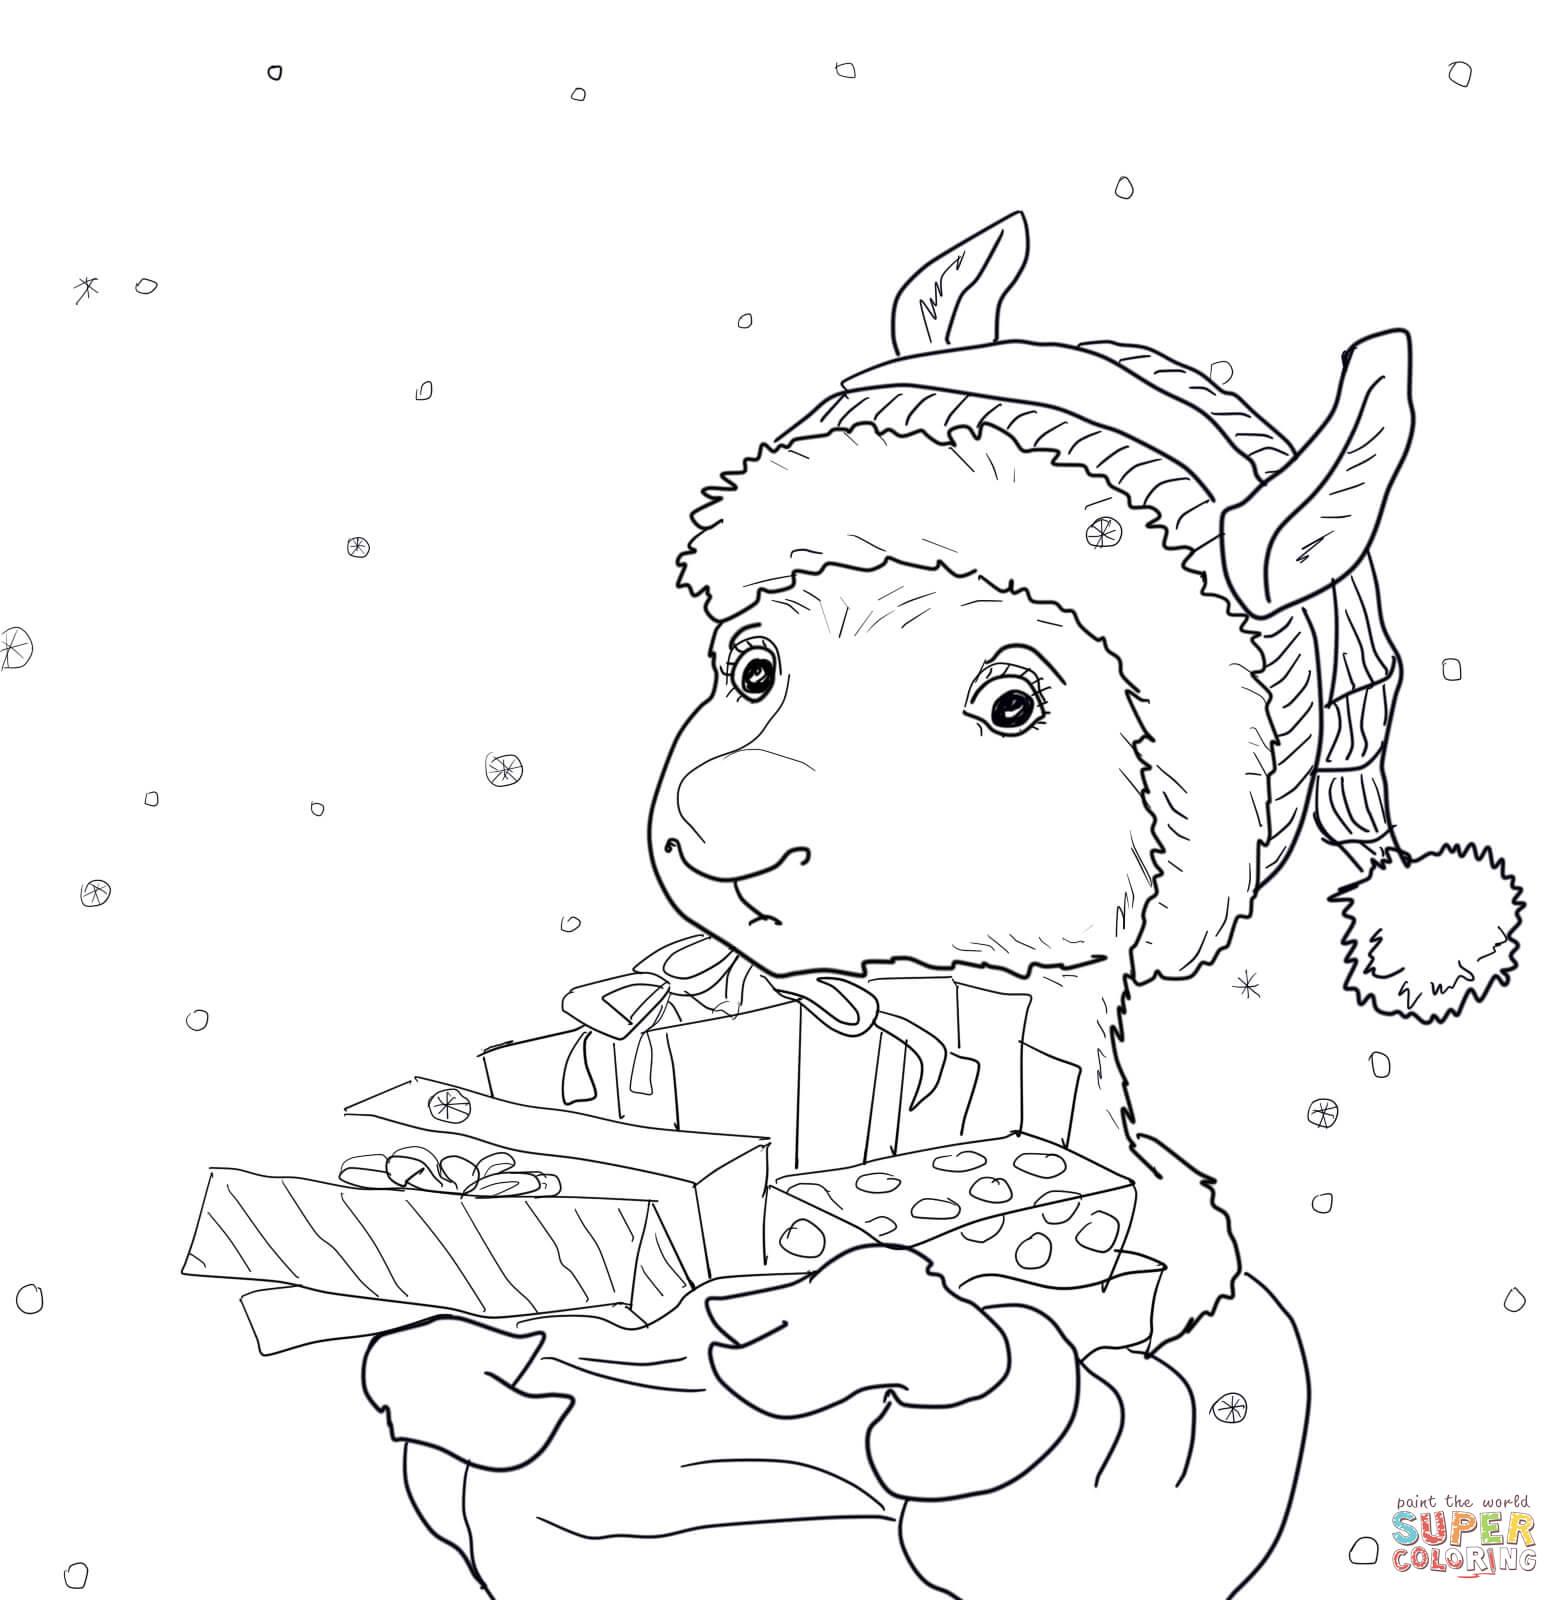 1560x1600 Llama Coloring Page